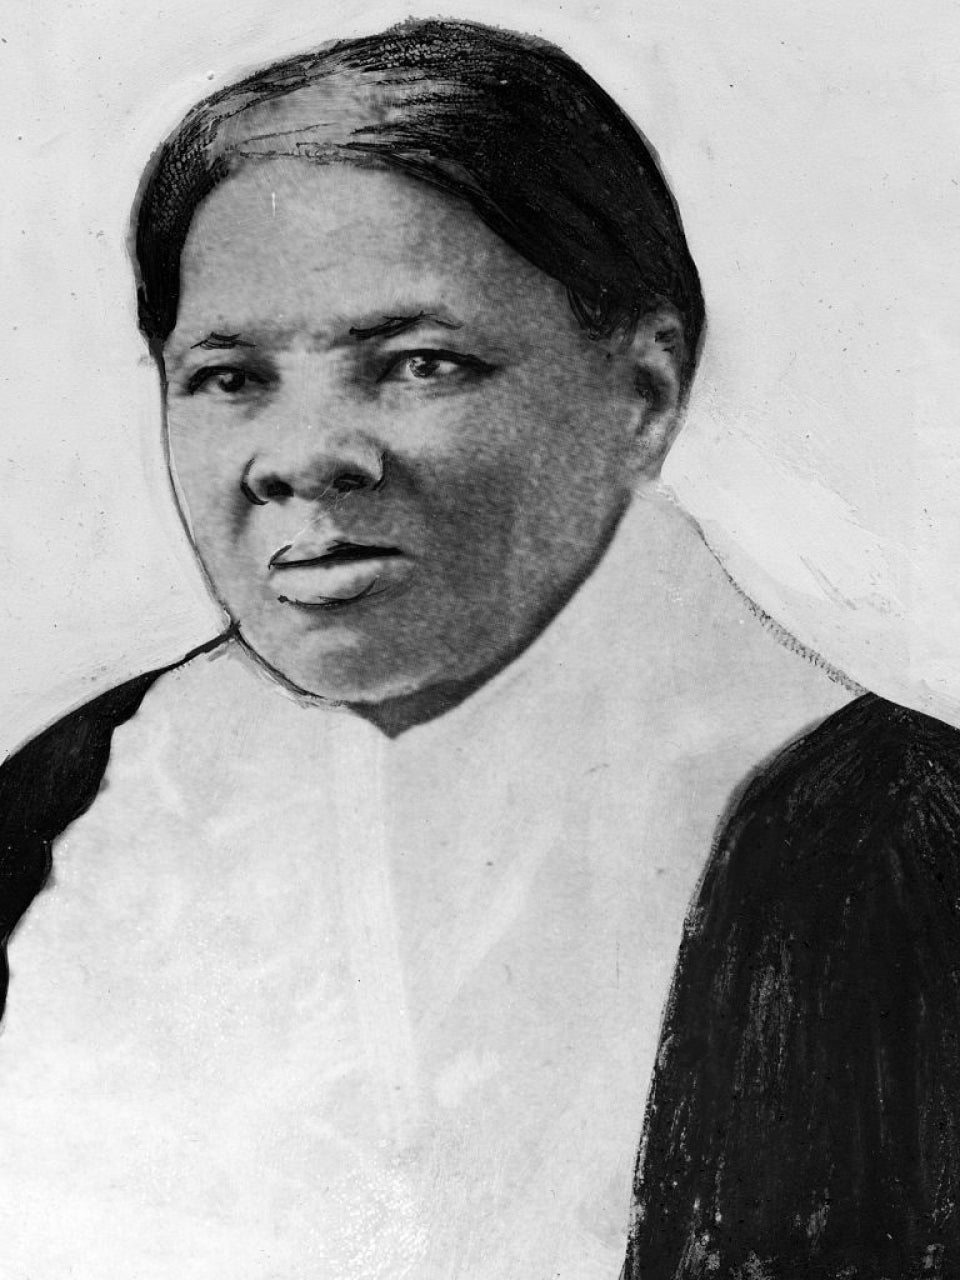 Biden Administration Wants To Speed Up Effort To Put Harriet Tubman On $20 bill